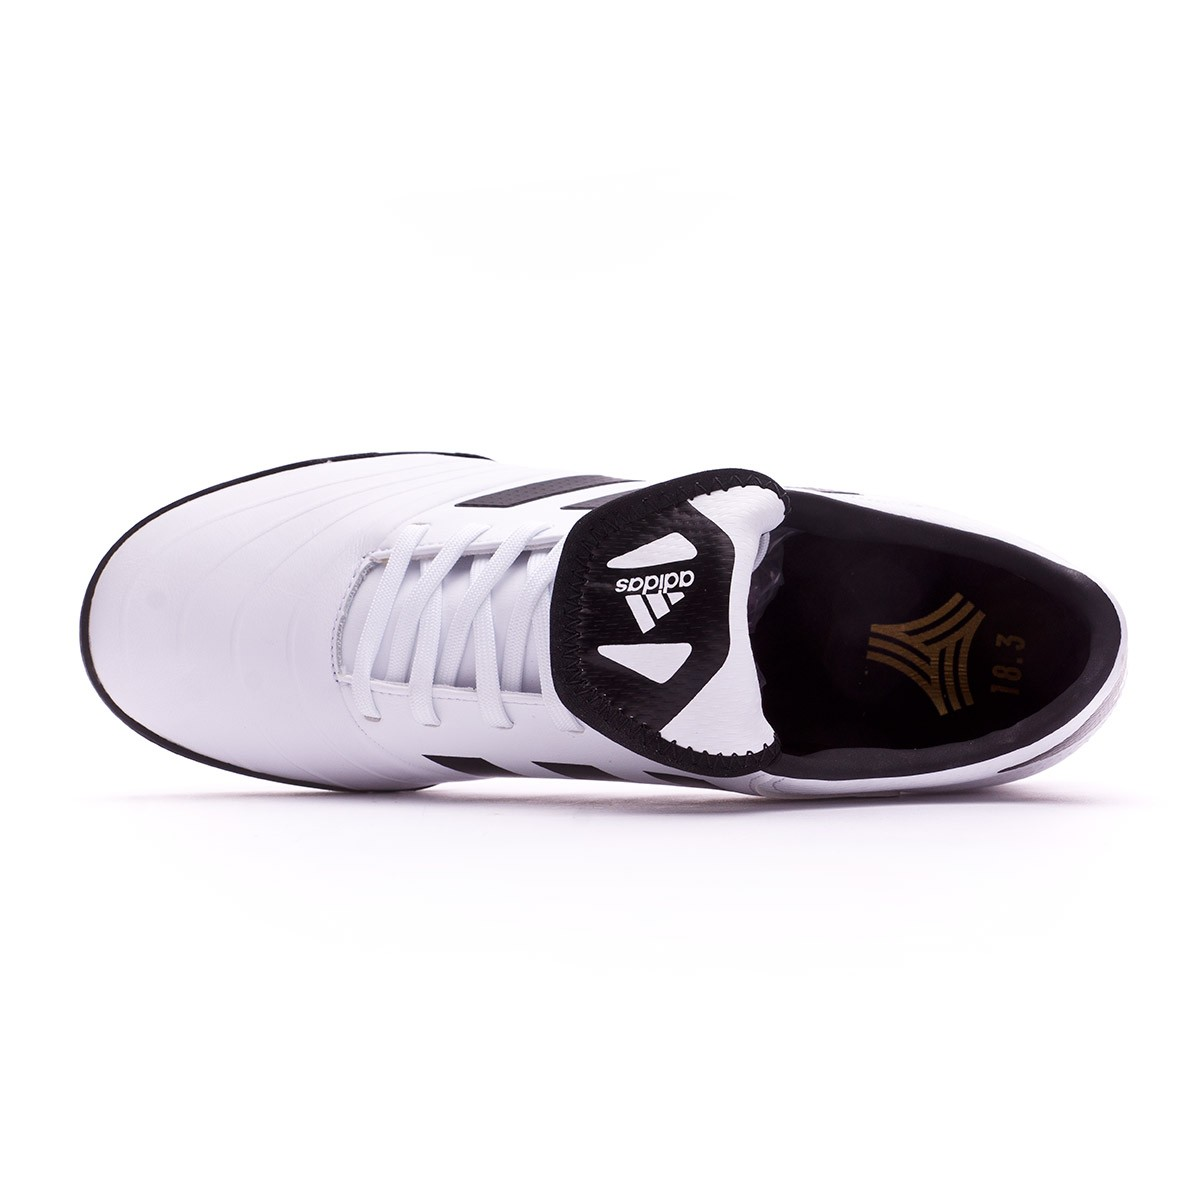 cheap for discount c2a2a 363bb Football Boot adidas Copa Tango 18.3 Turf White-Core black-Gold metallic -  Football store Fútbol Emotion